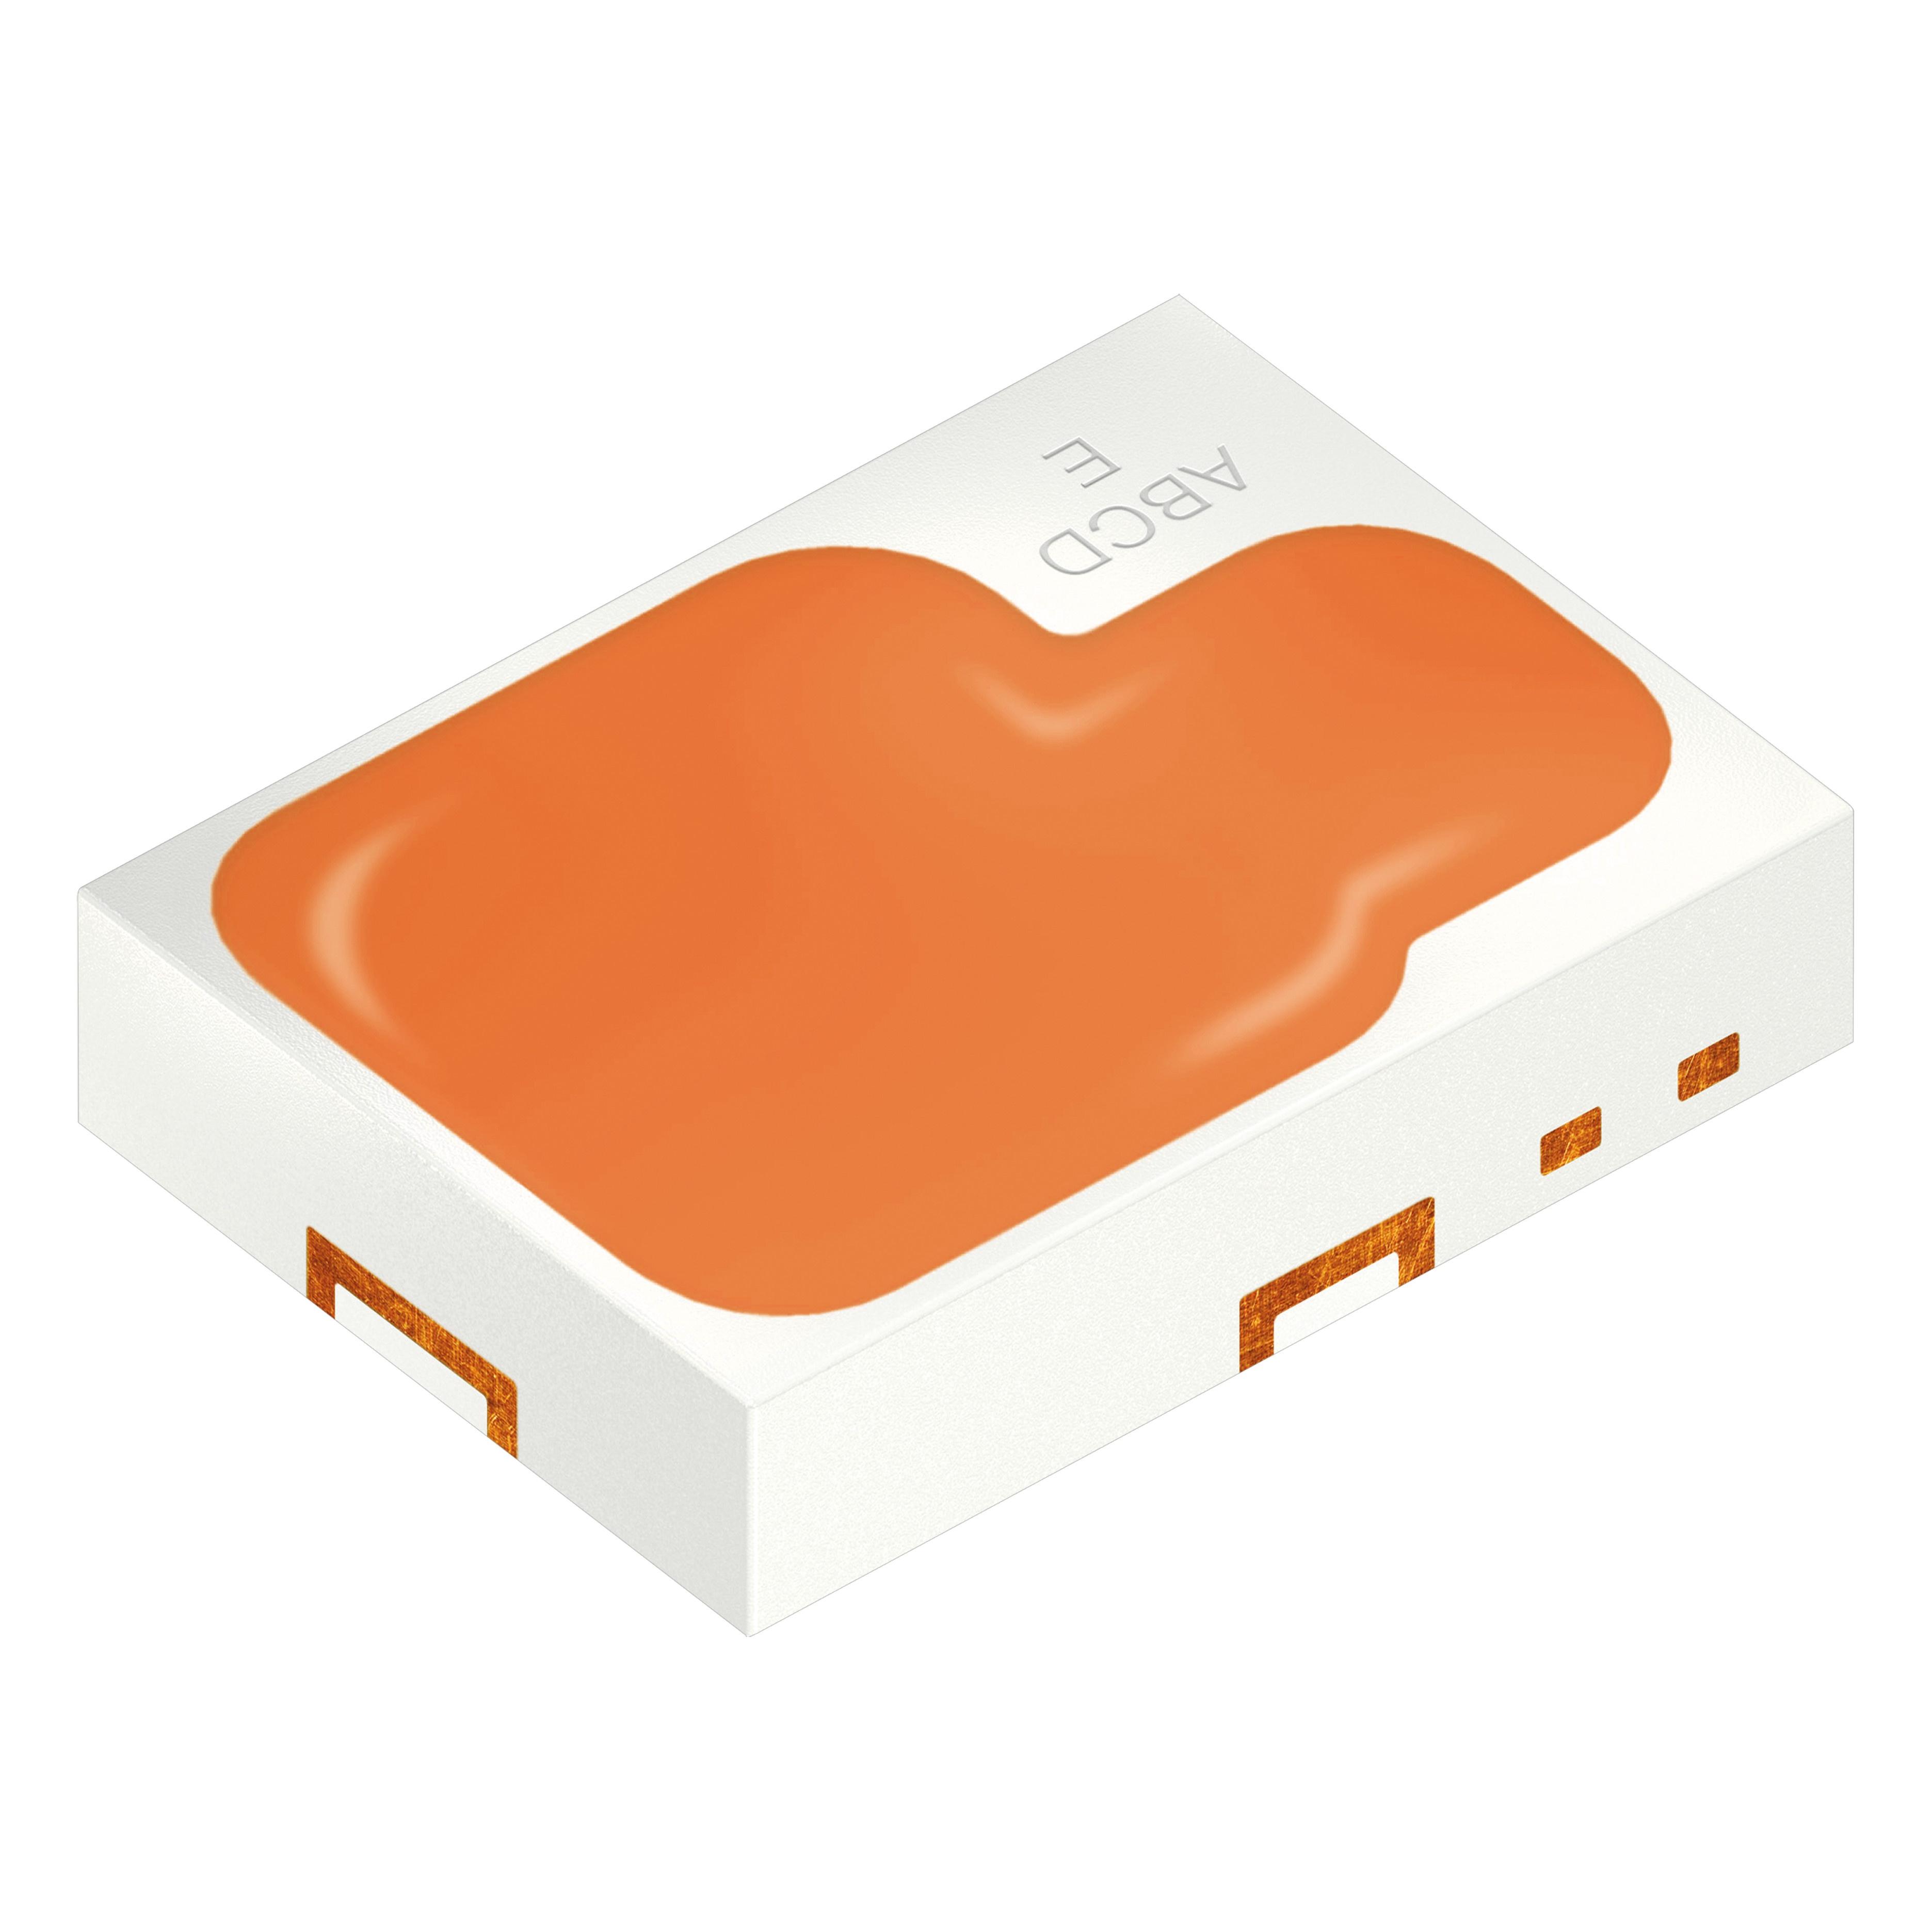 New LED from Osram Provides Optimal visibility Even in Dense Fog